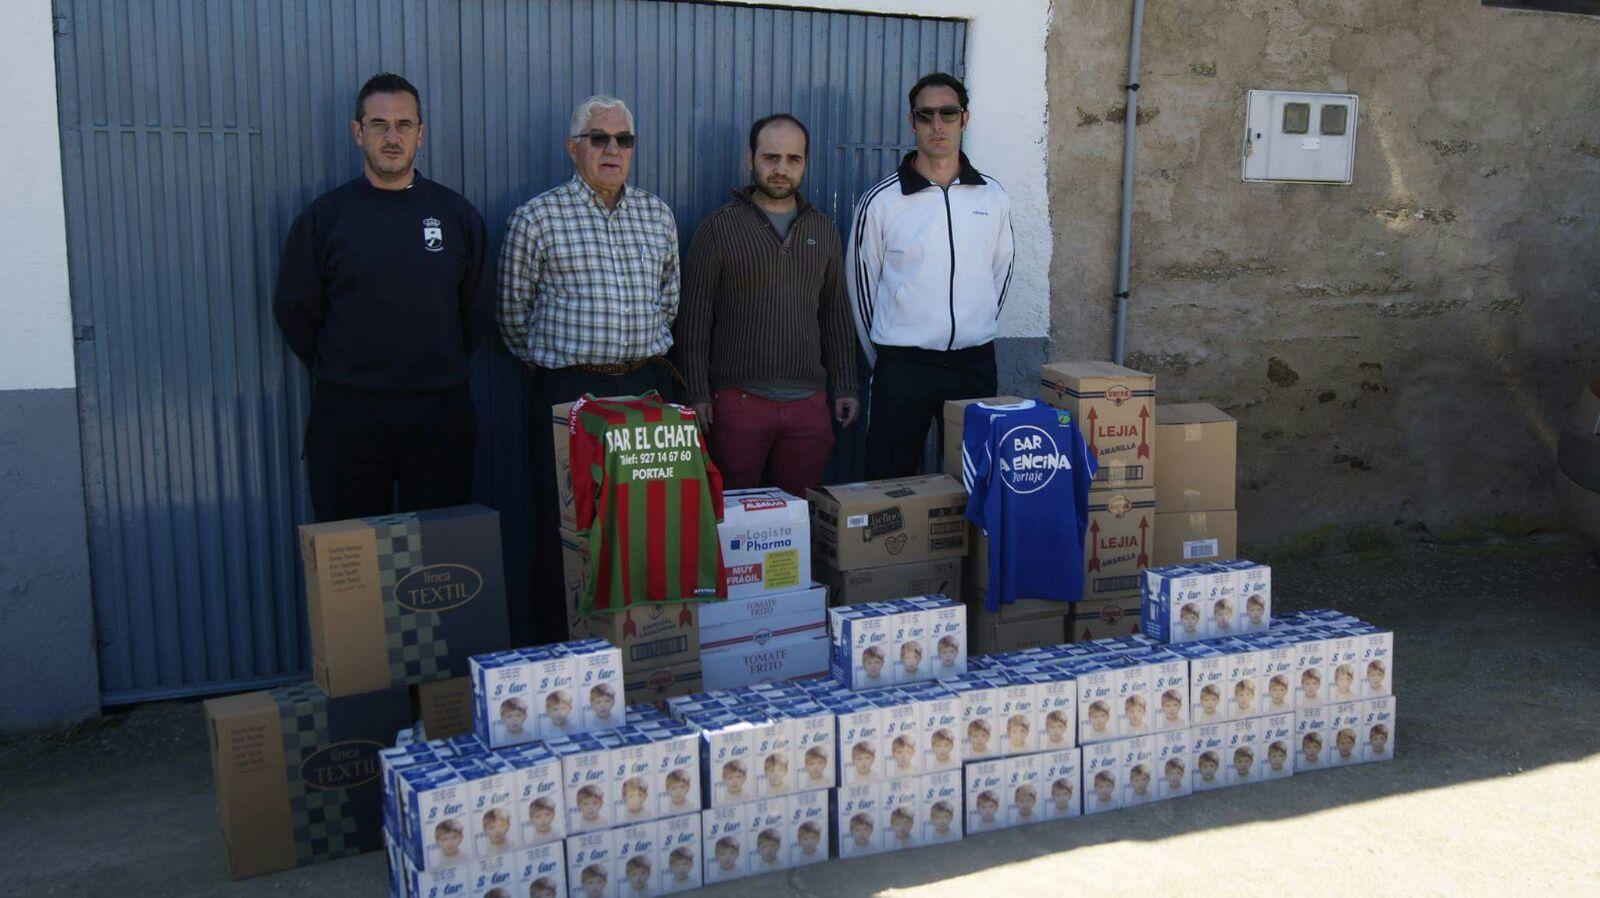 CD Portaje entrega su cesta solidaria a Cáritas